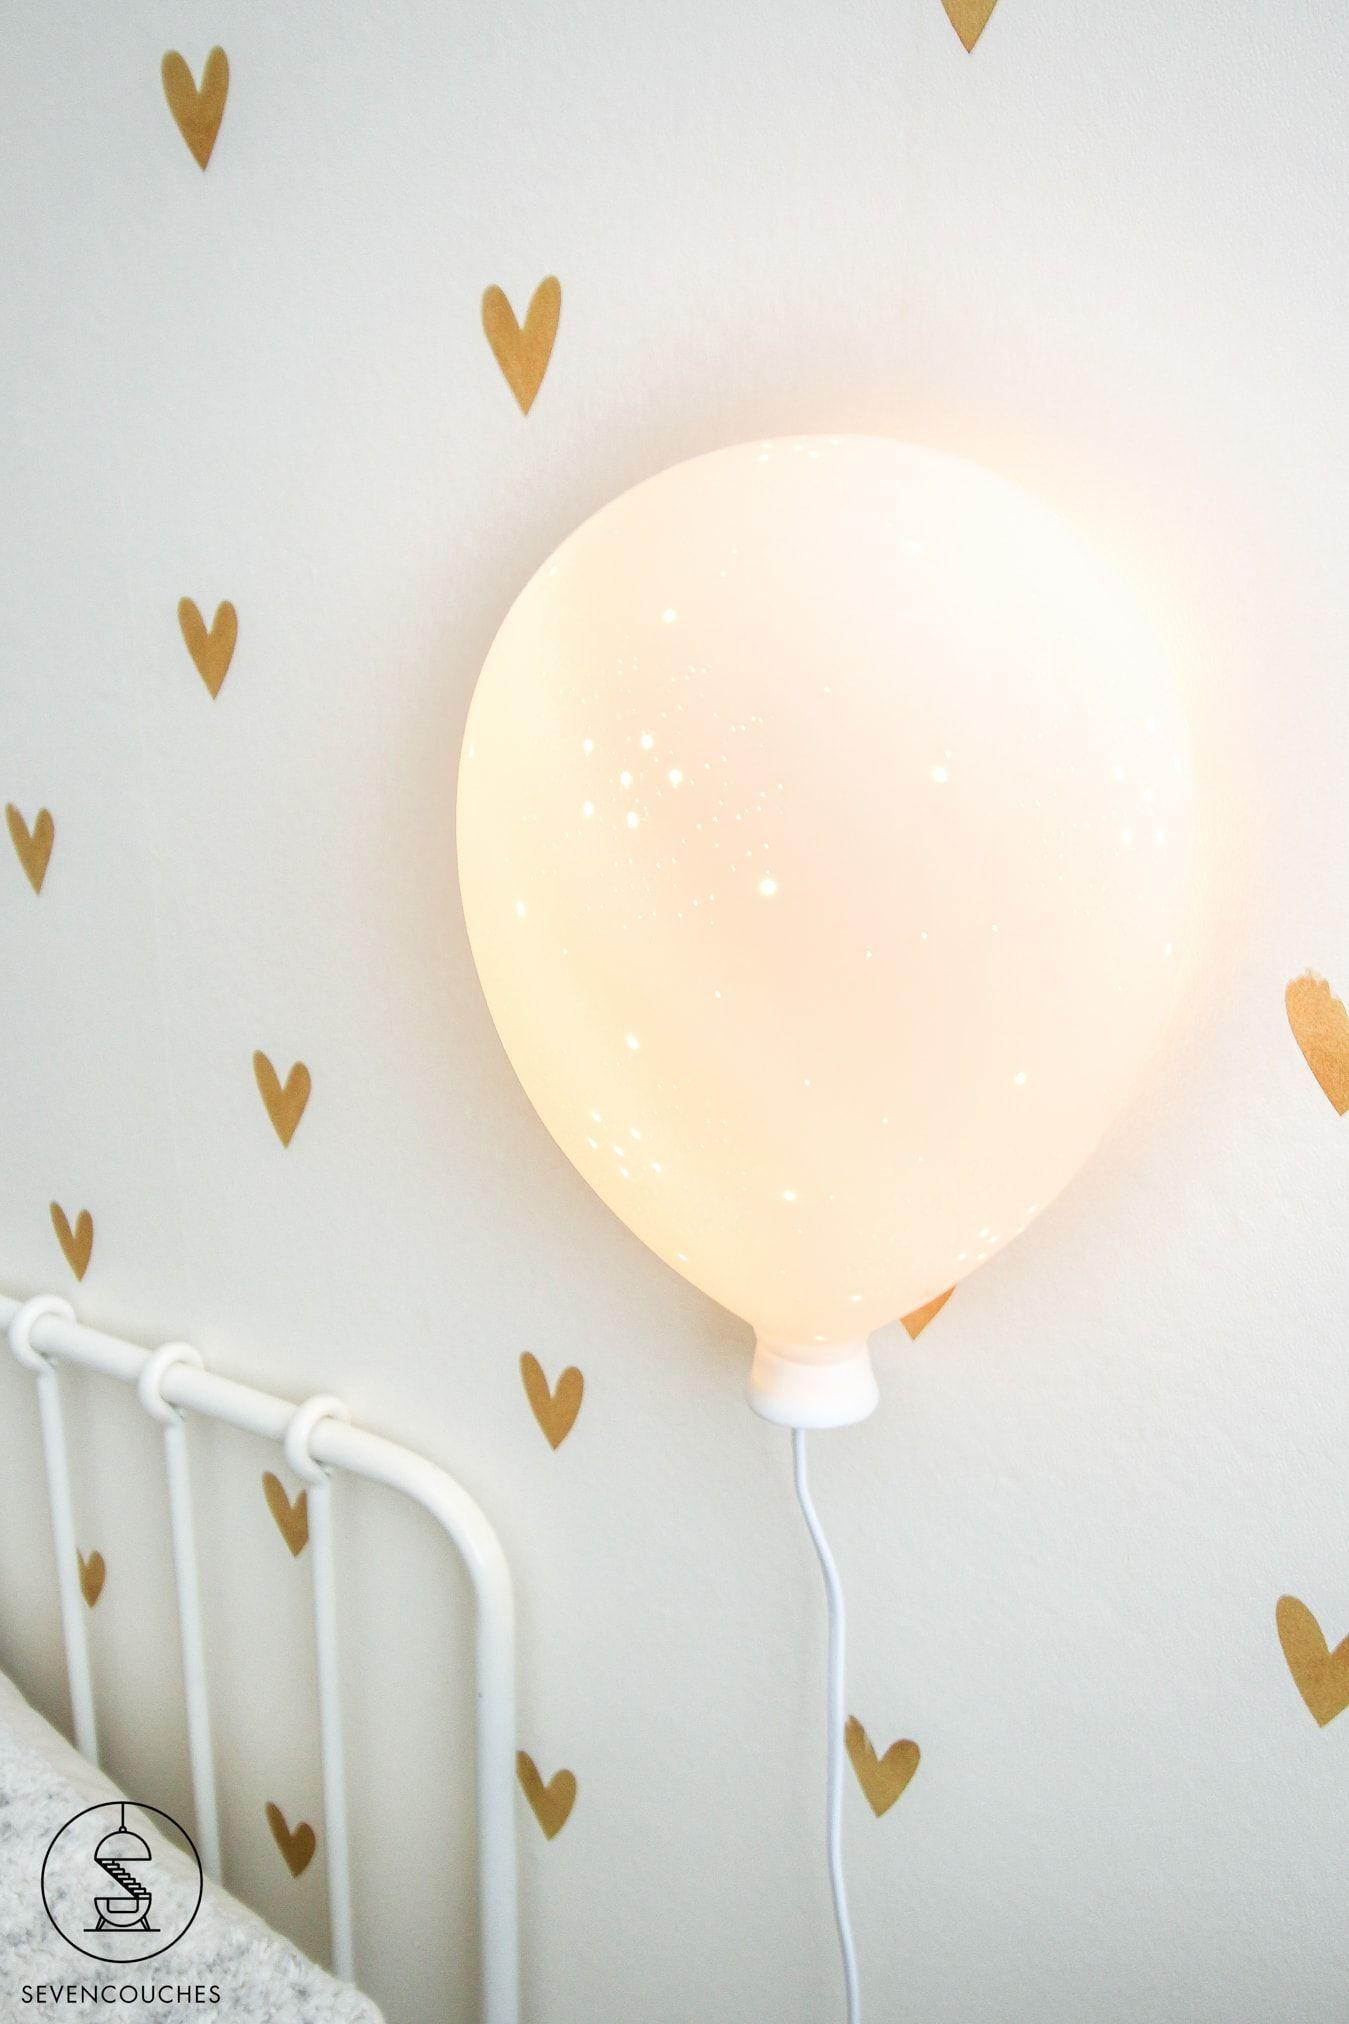 Lucide Balloon Wandlamp Kinderkamer 1xe14 Wit Peuterkamer Meisjes Lampen Kinderkamer Kinderkamer